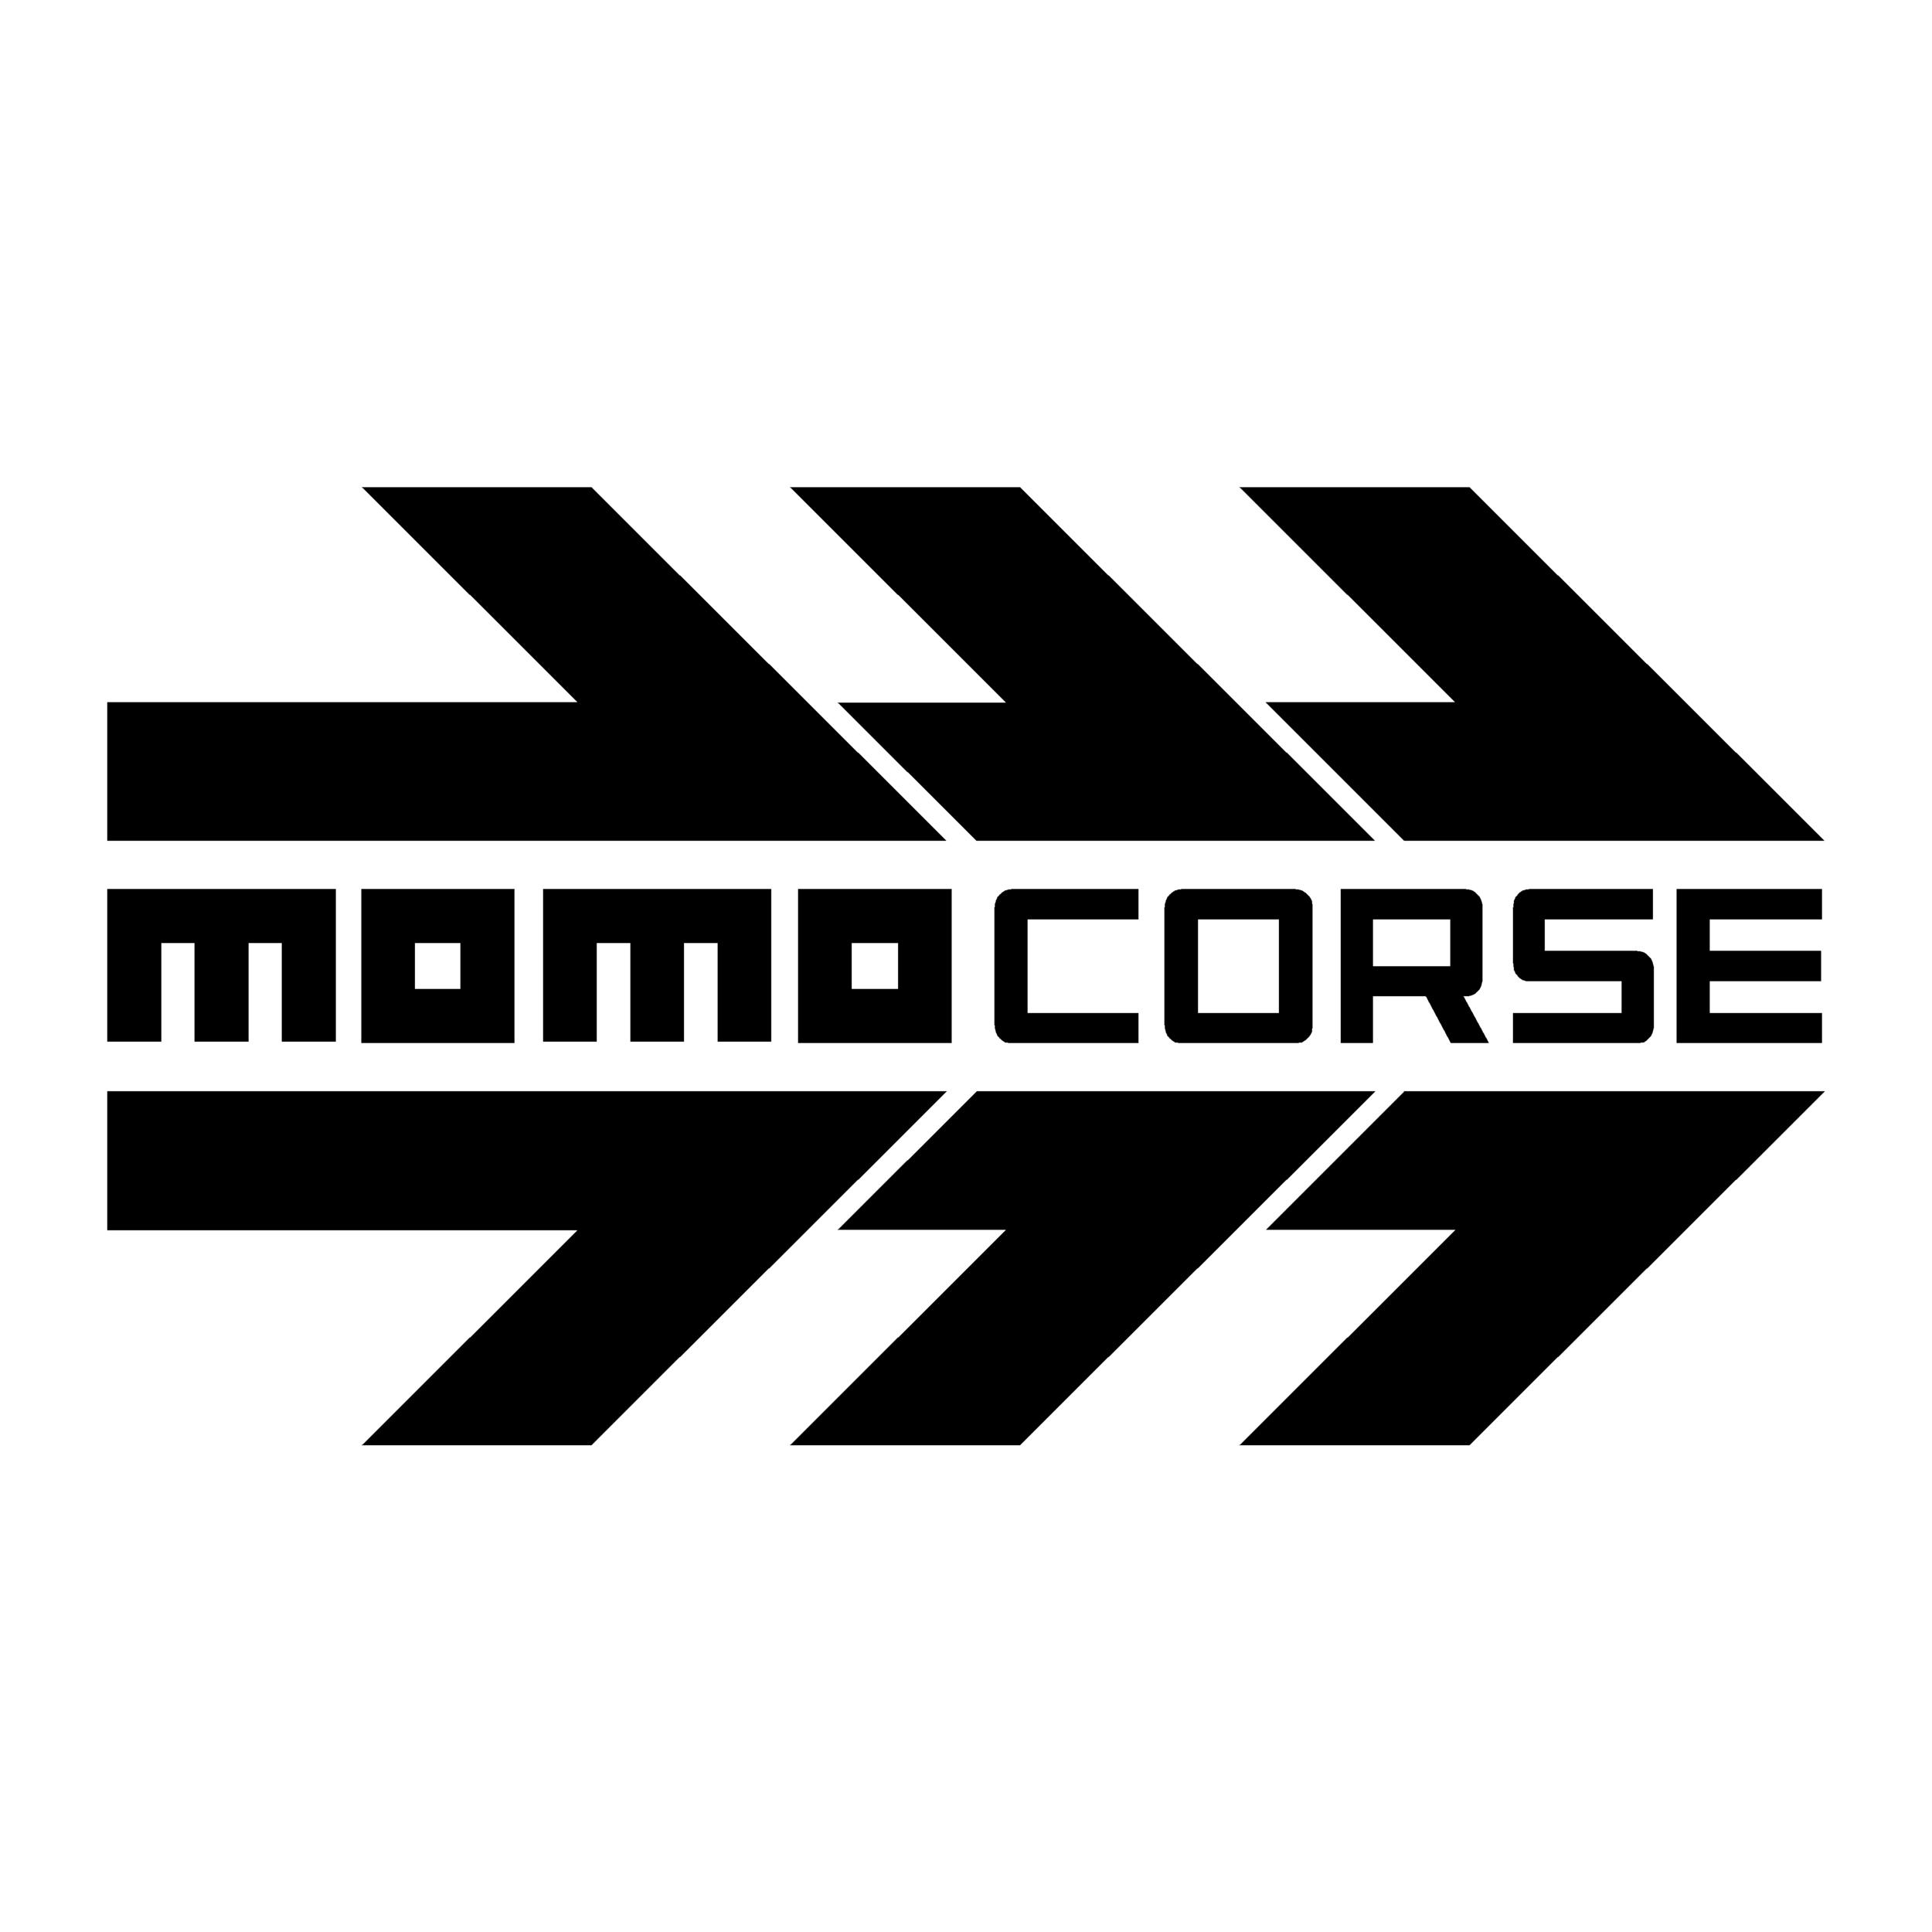 sticker momo ref 3 tuning audio sonorisation car auto moto camion competition deco rallye autocollant